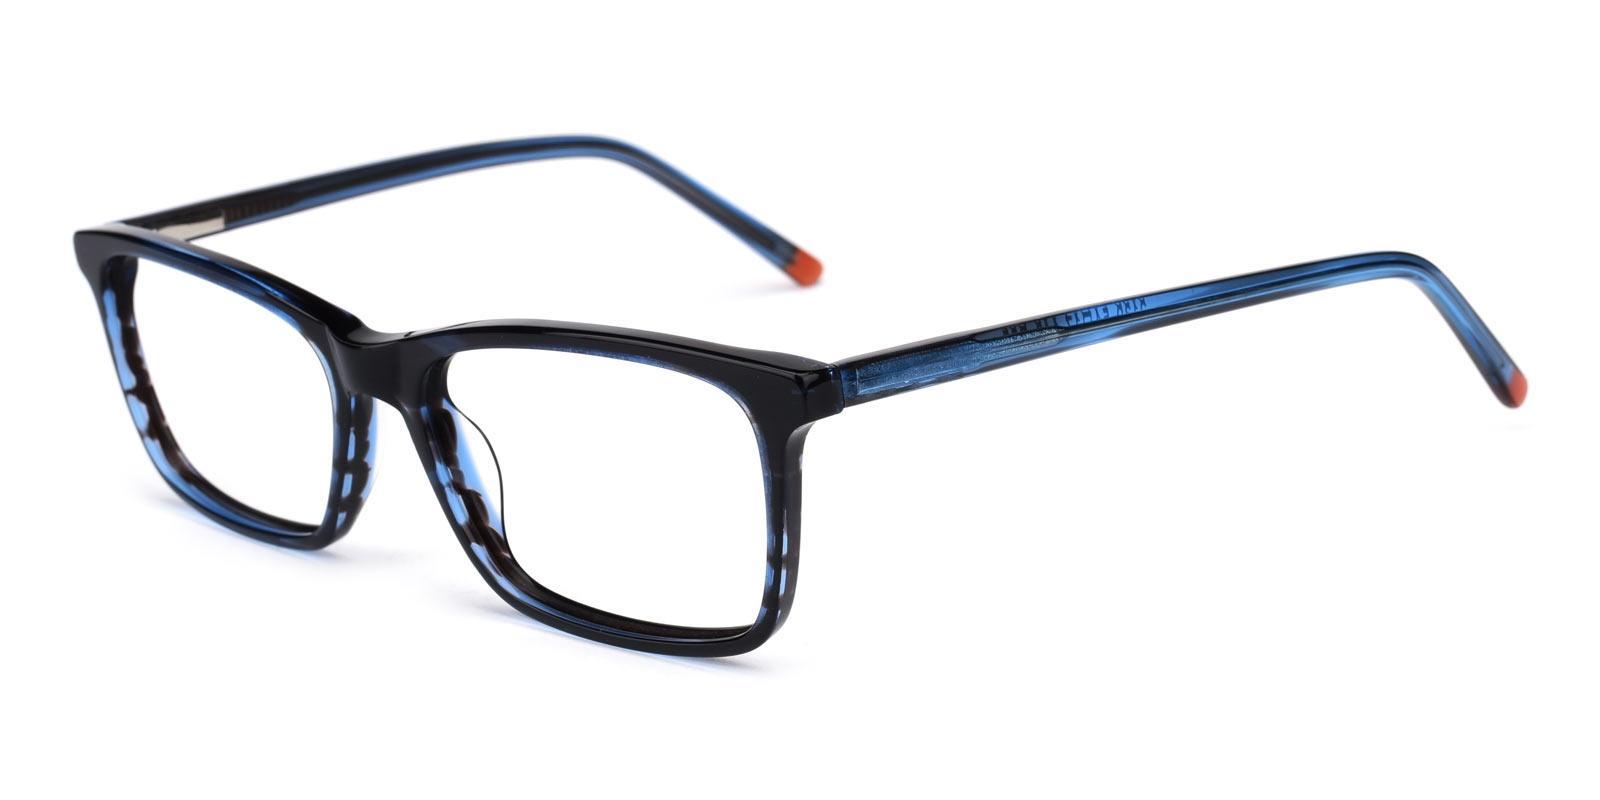 Crane-Striped-Rectangle-Acetate-Eyeglasses-additional1